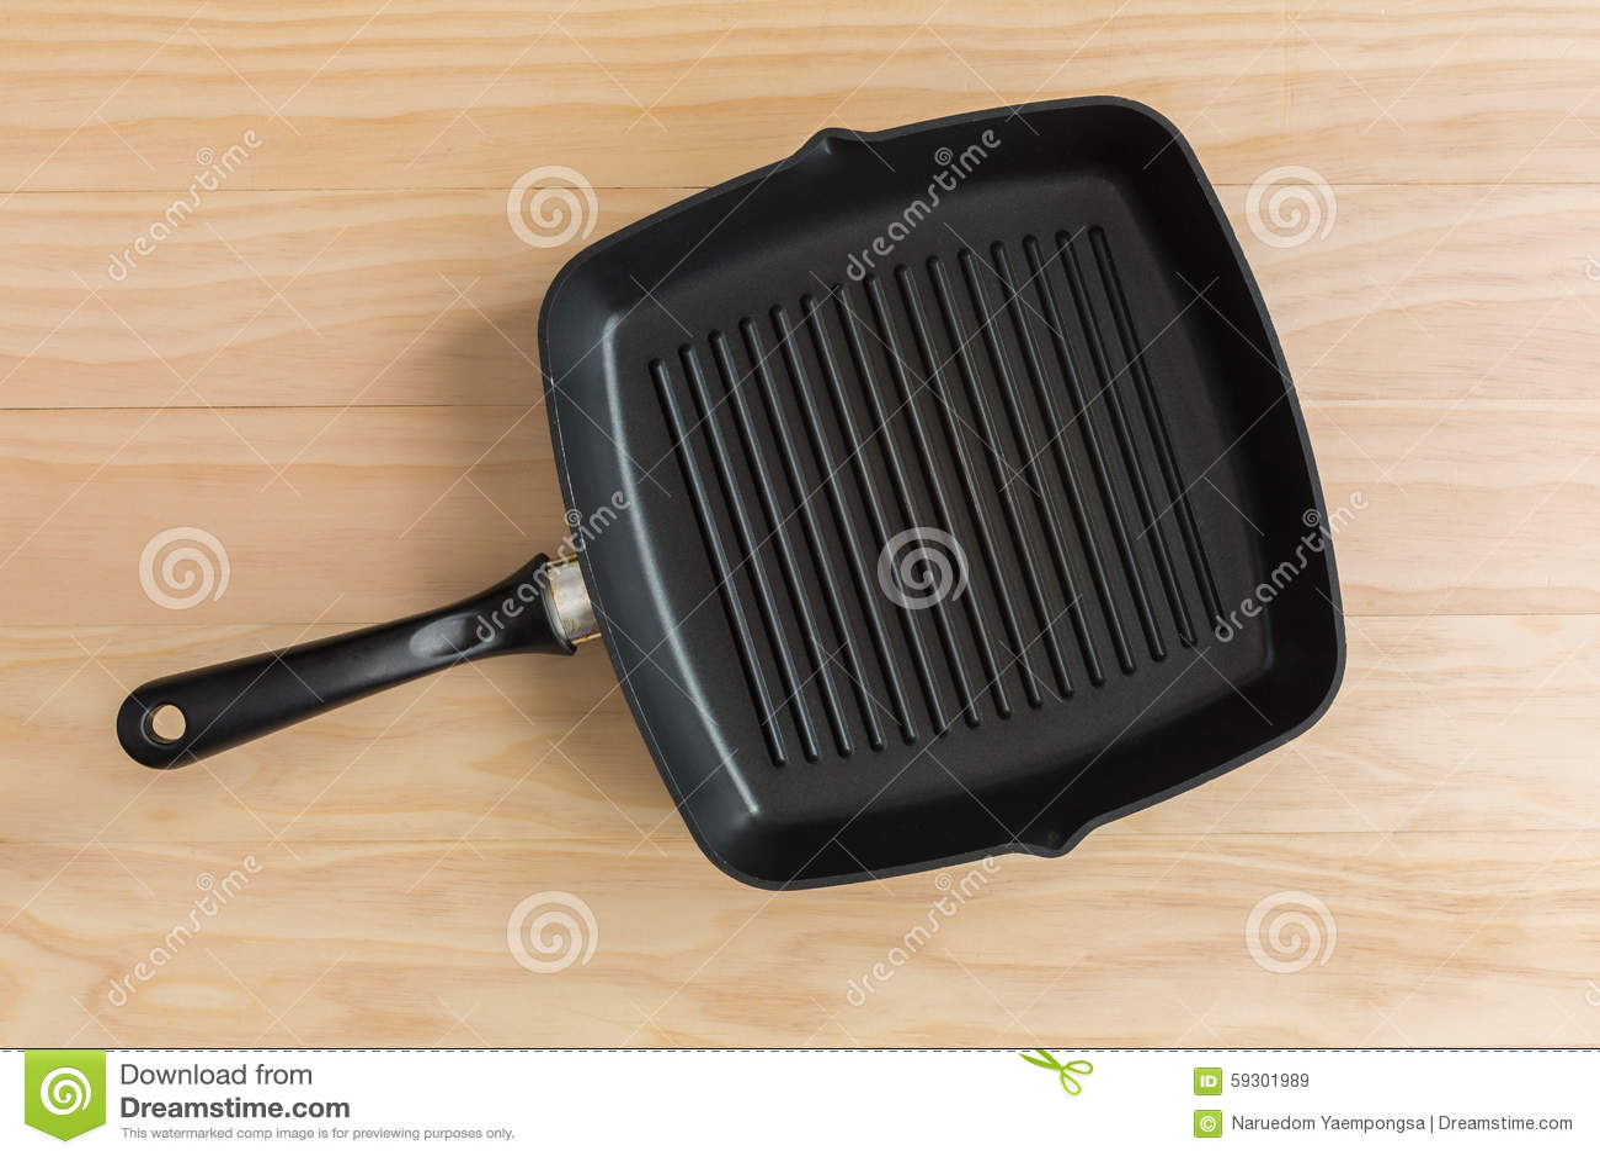 Non casserole de gril de bâton